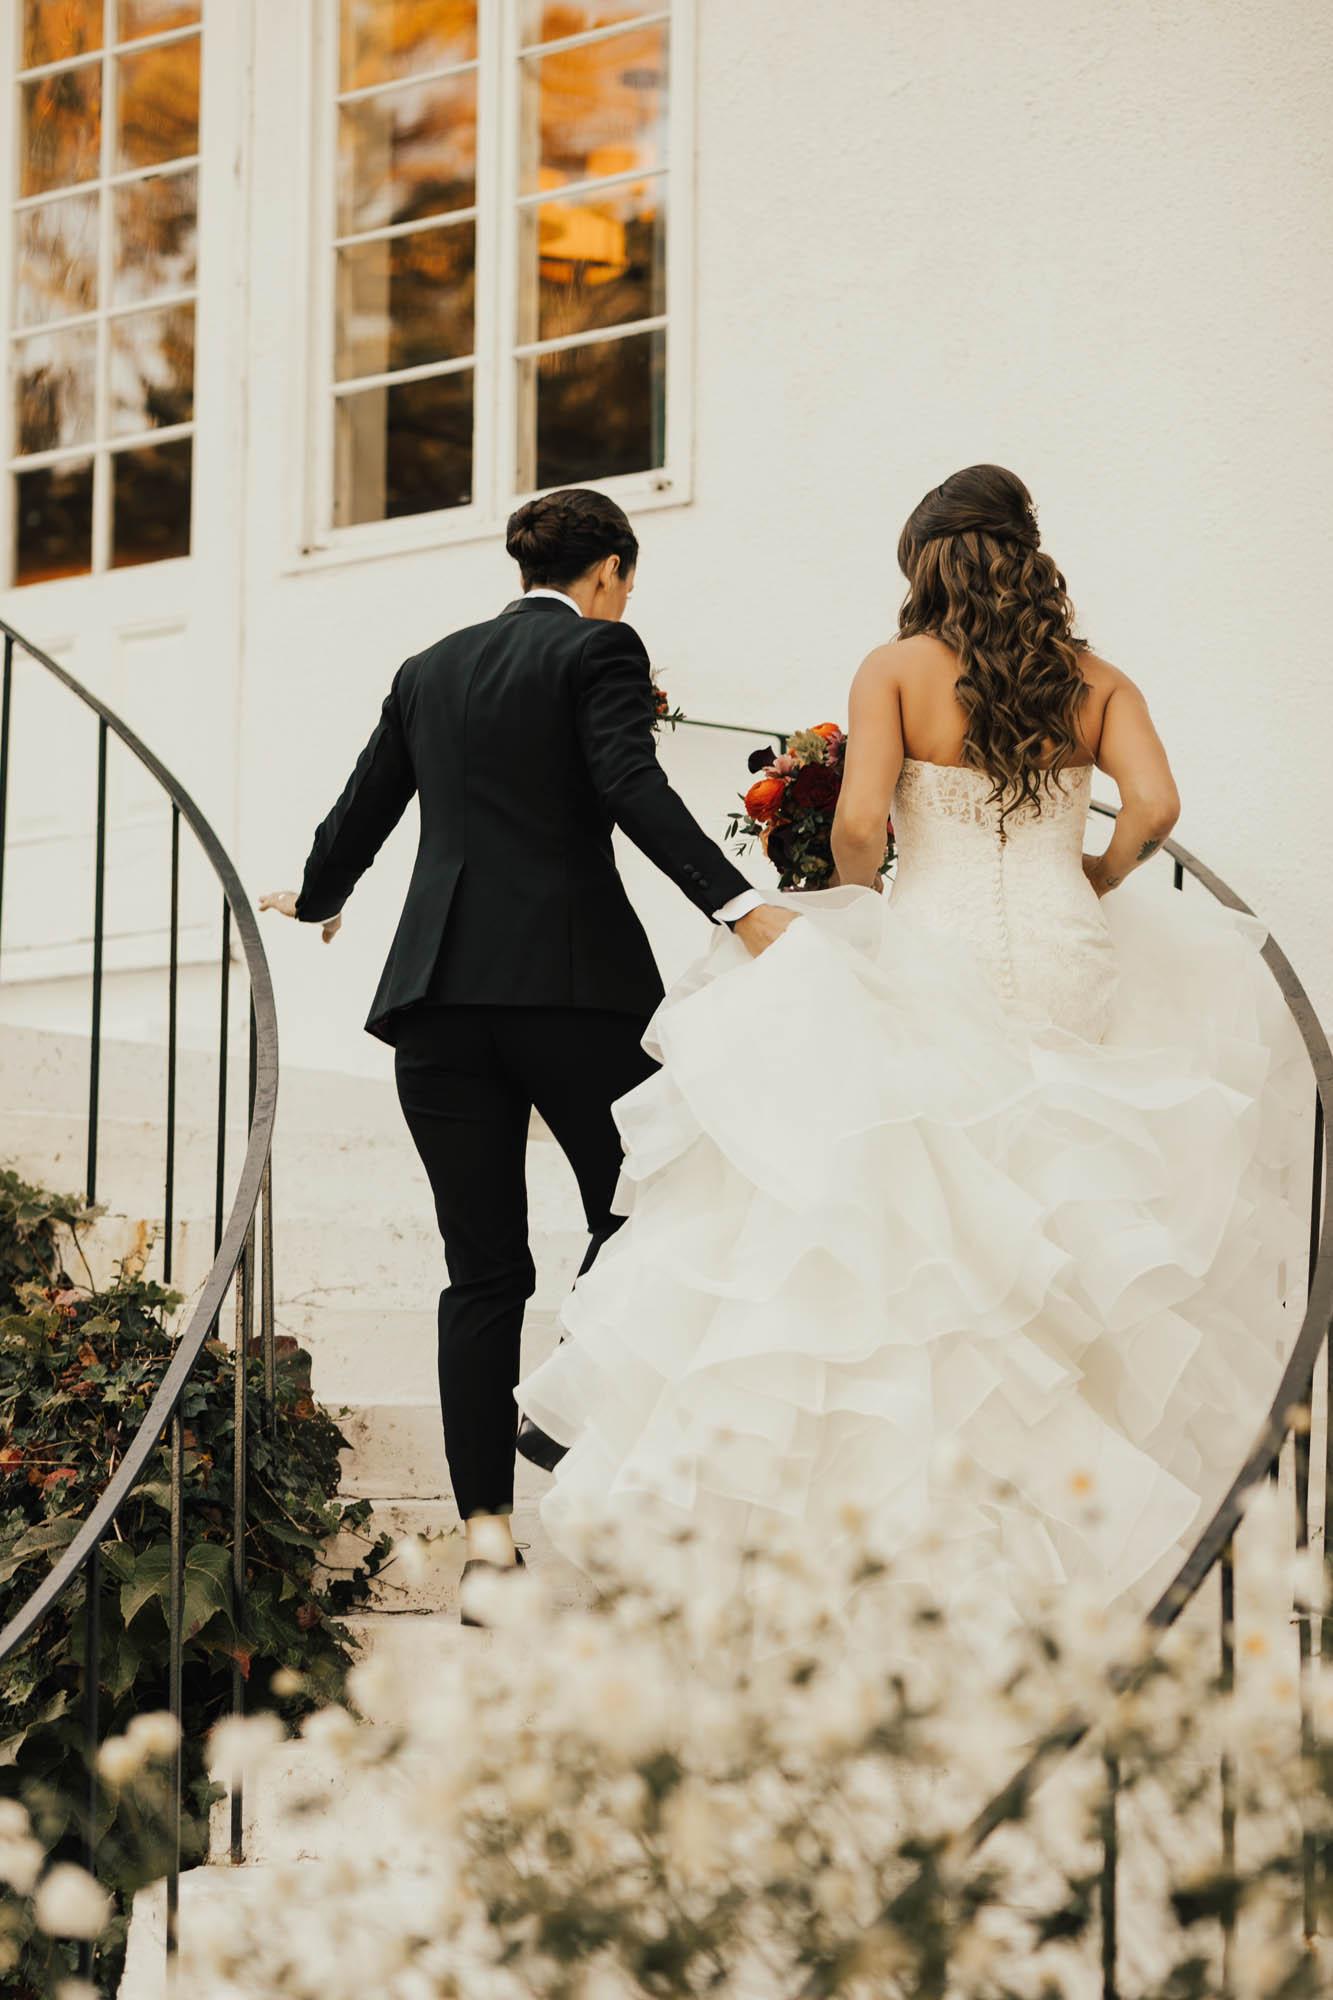 Woodland Indoor Wedding - New York - Lesbian Wedding - Dancing With Her